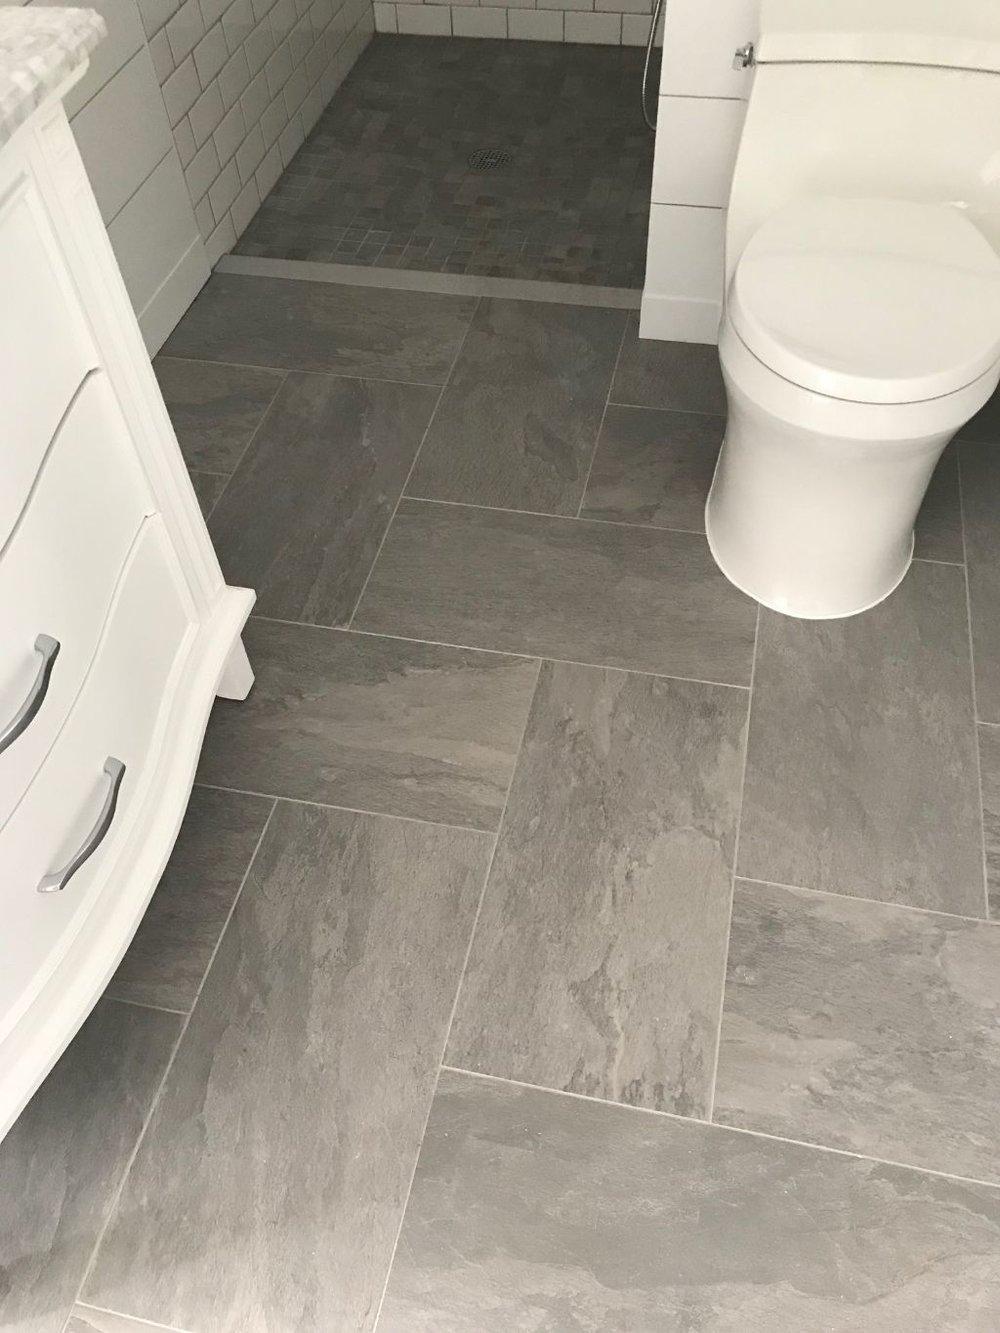 Gormley Designs LLC T main floor and shower floor.jpg